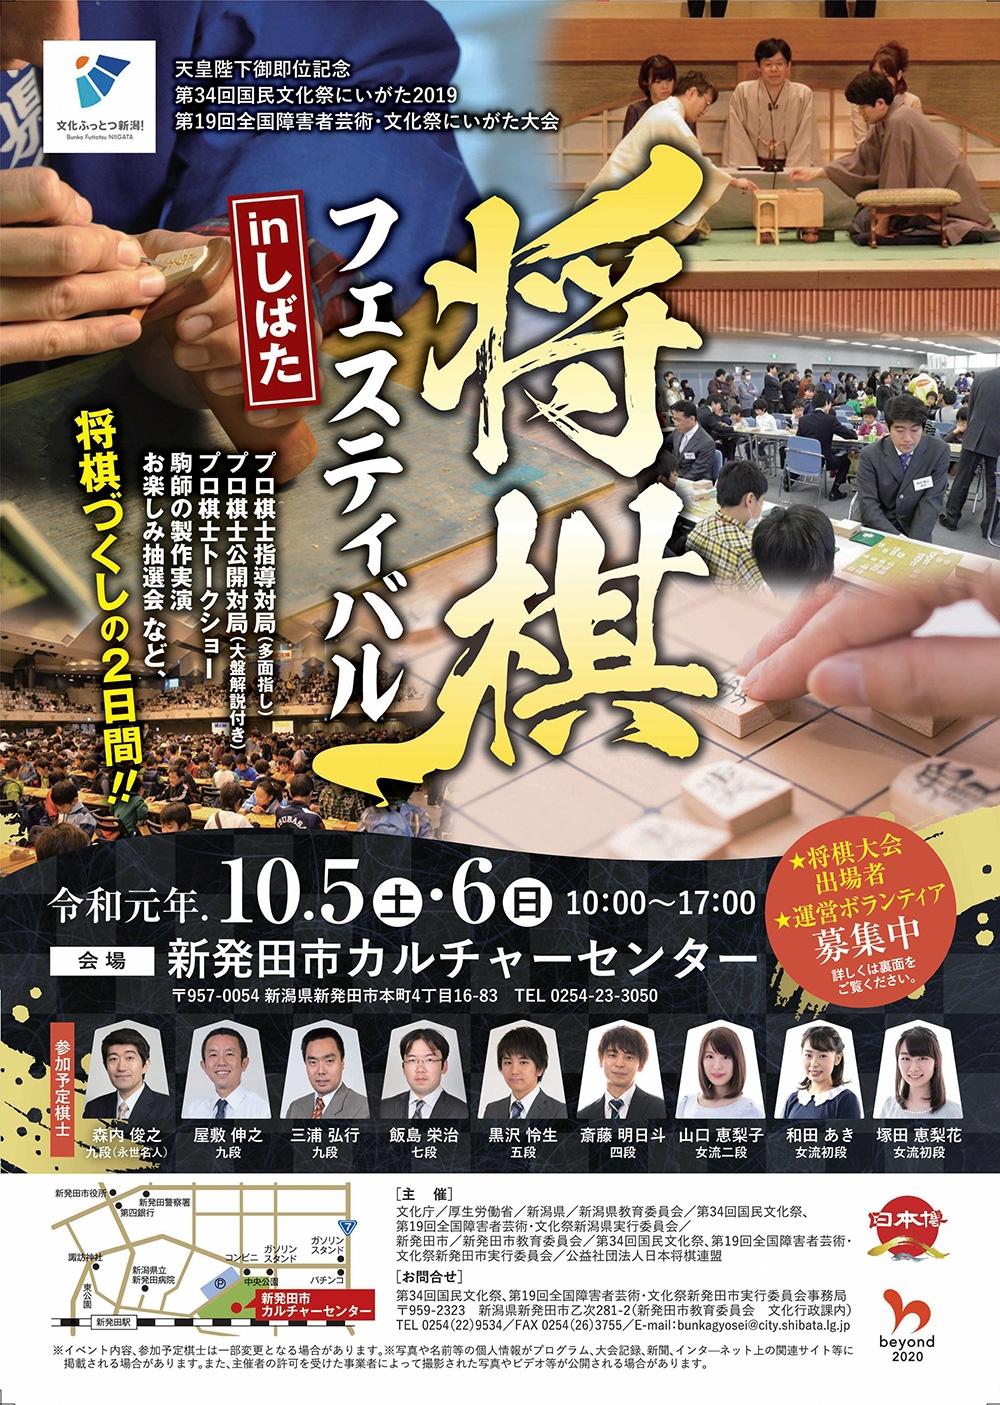 https://www.shogi.or.jp/event/34nationalshogifes-1.jpg